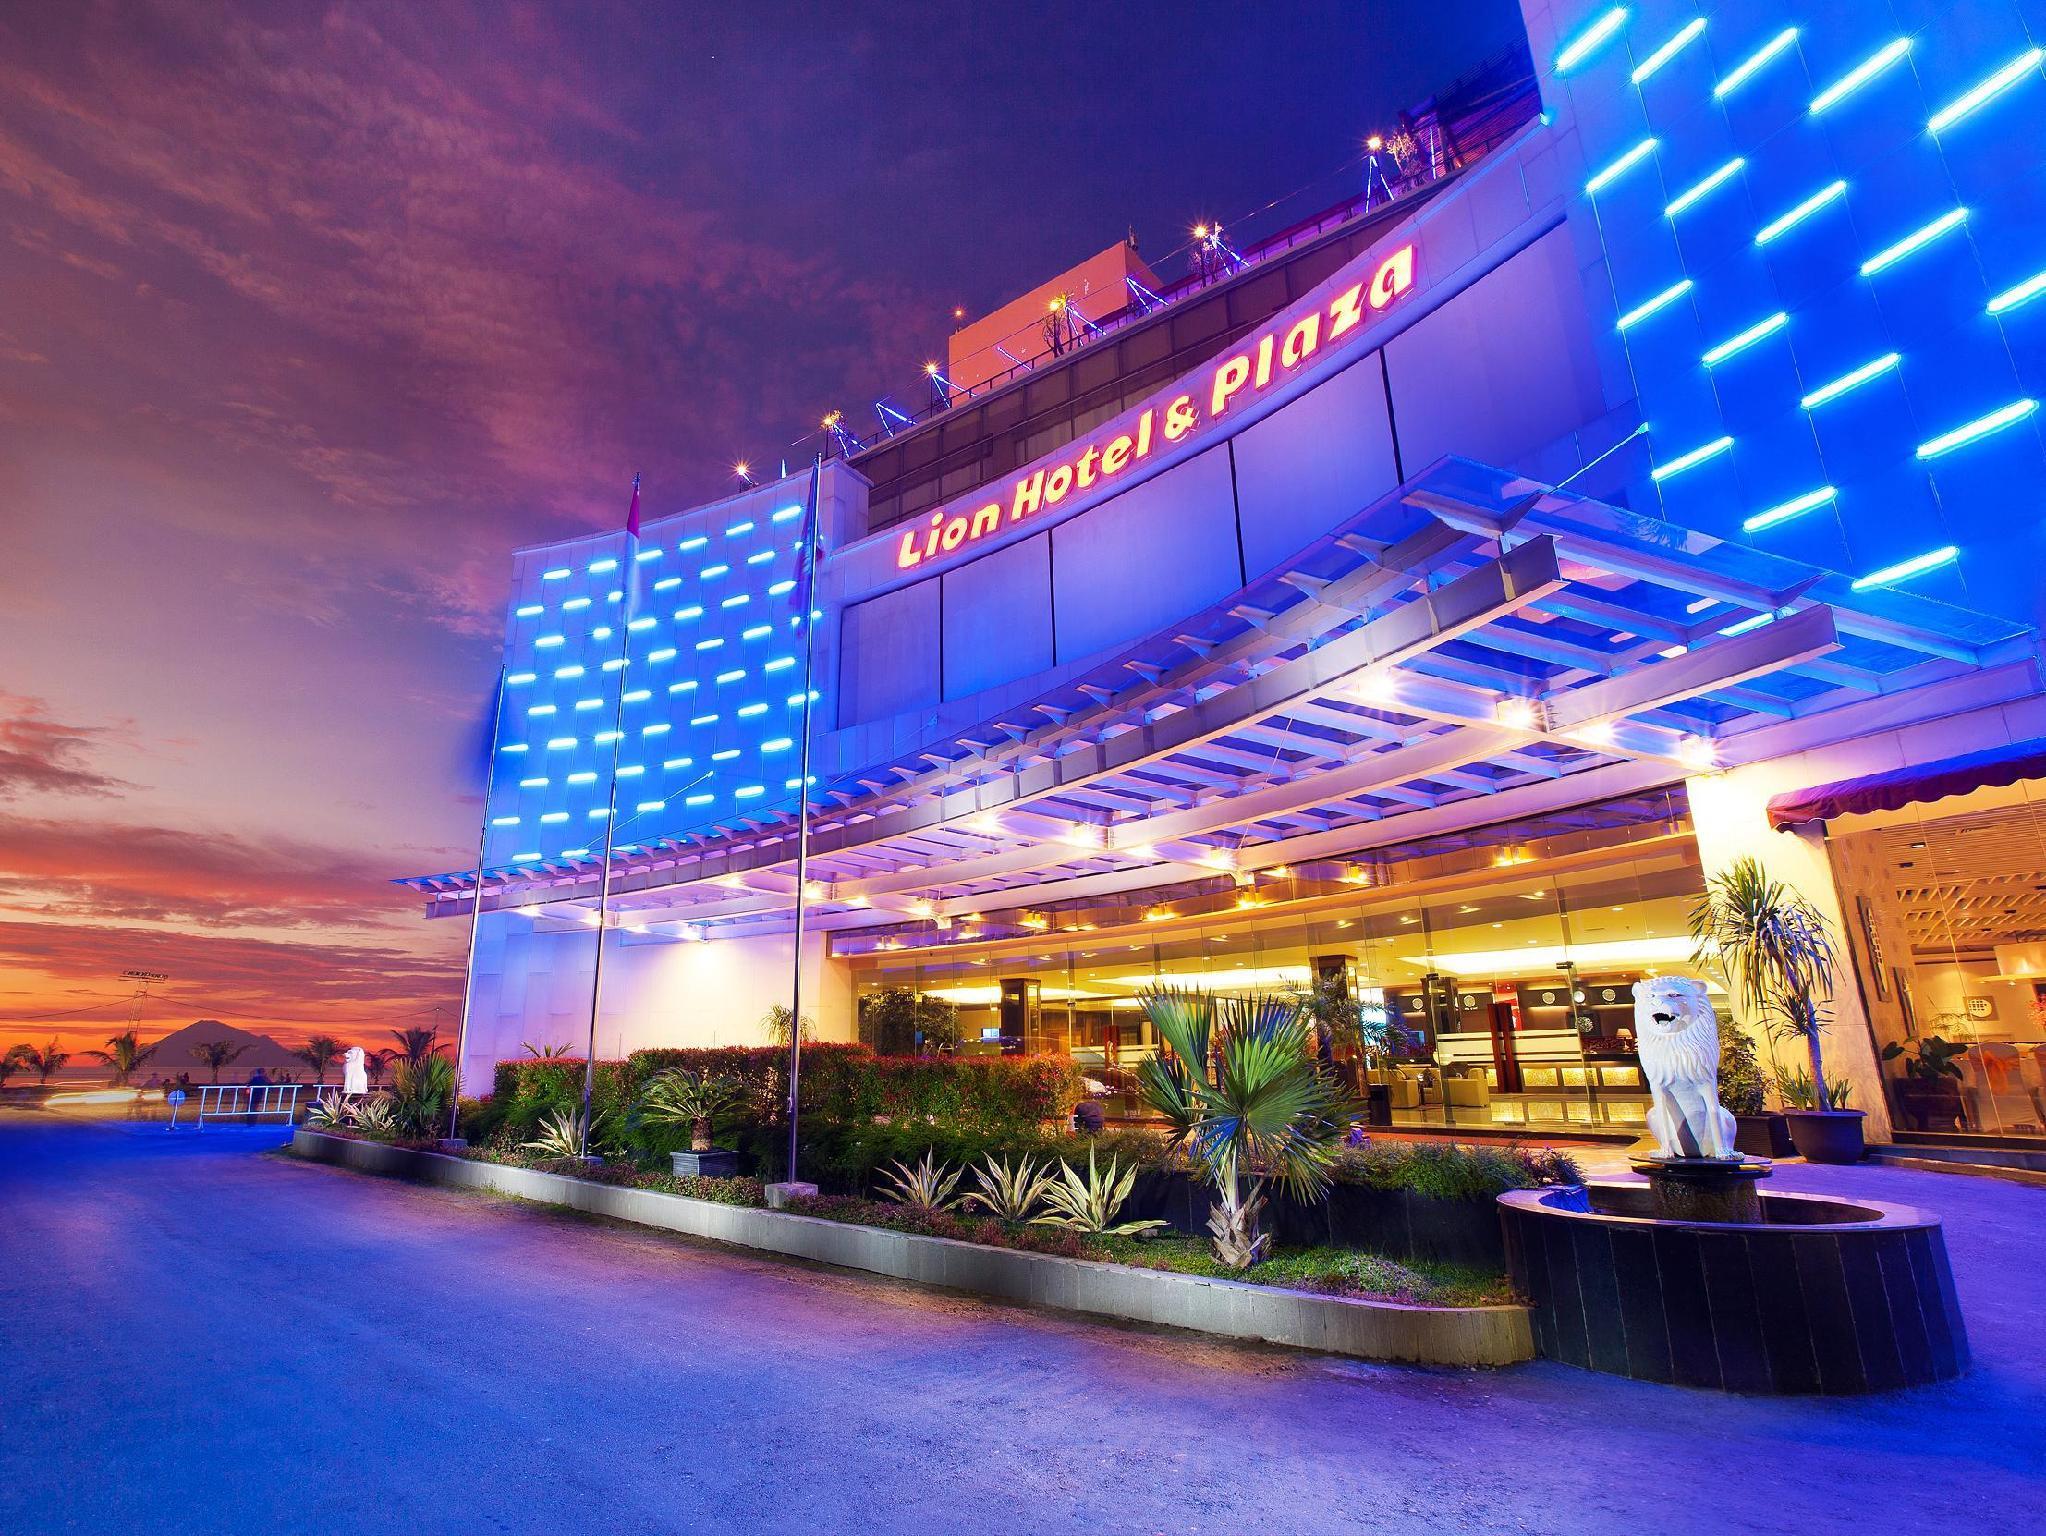 lion hotel plaza manado indonesia from 46 save on agoda rh agoda com